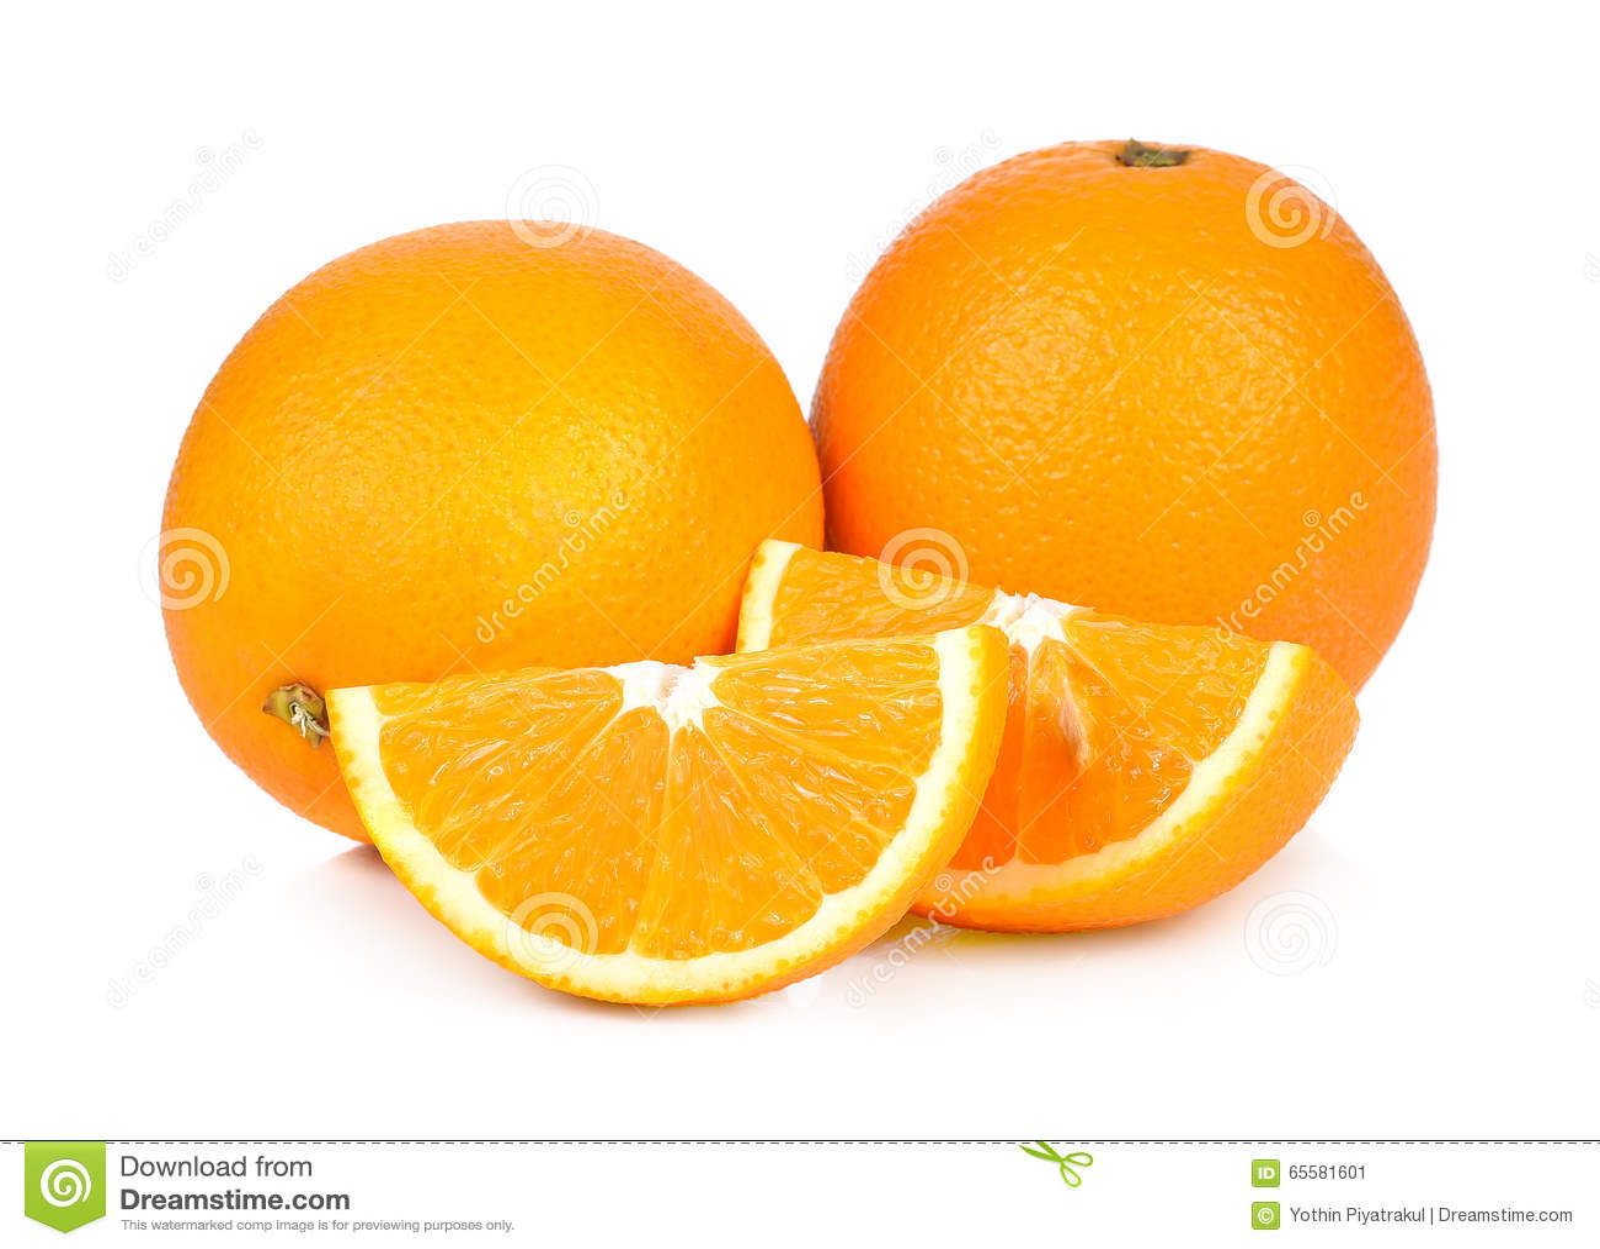 Fruto da laranja doce no fundo branco